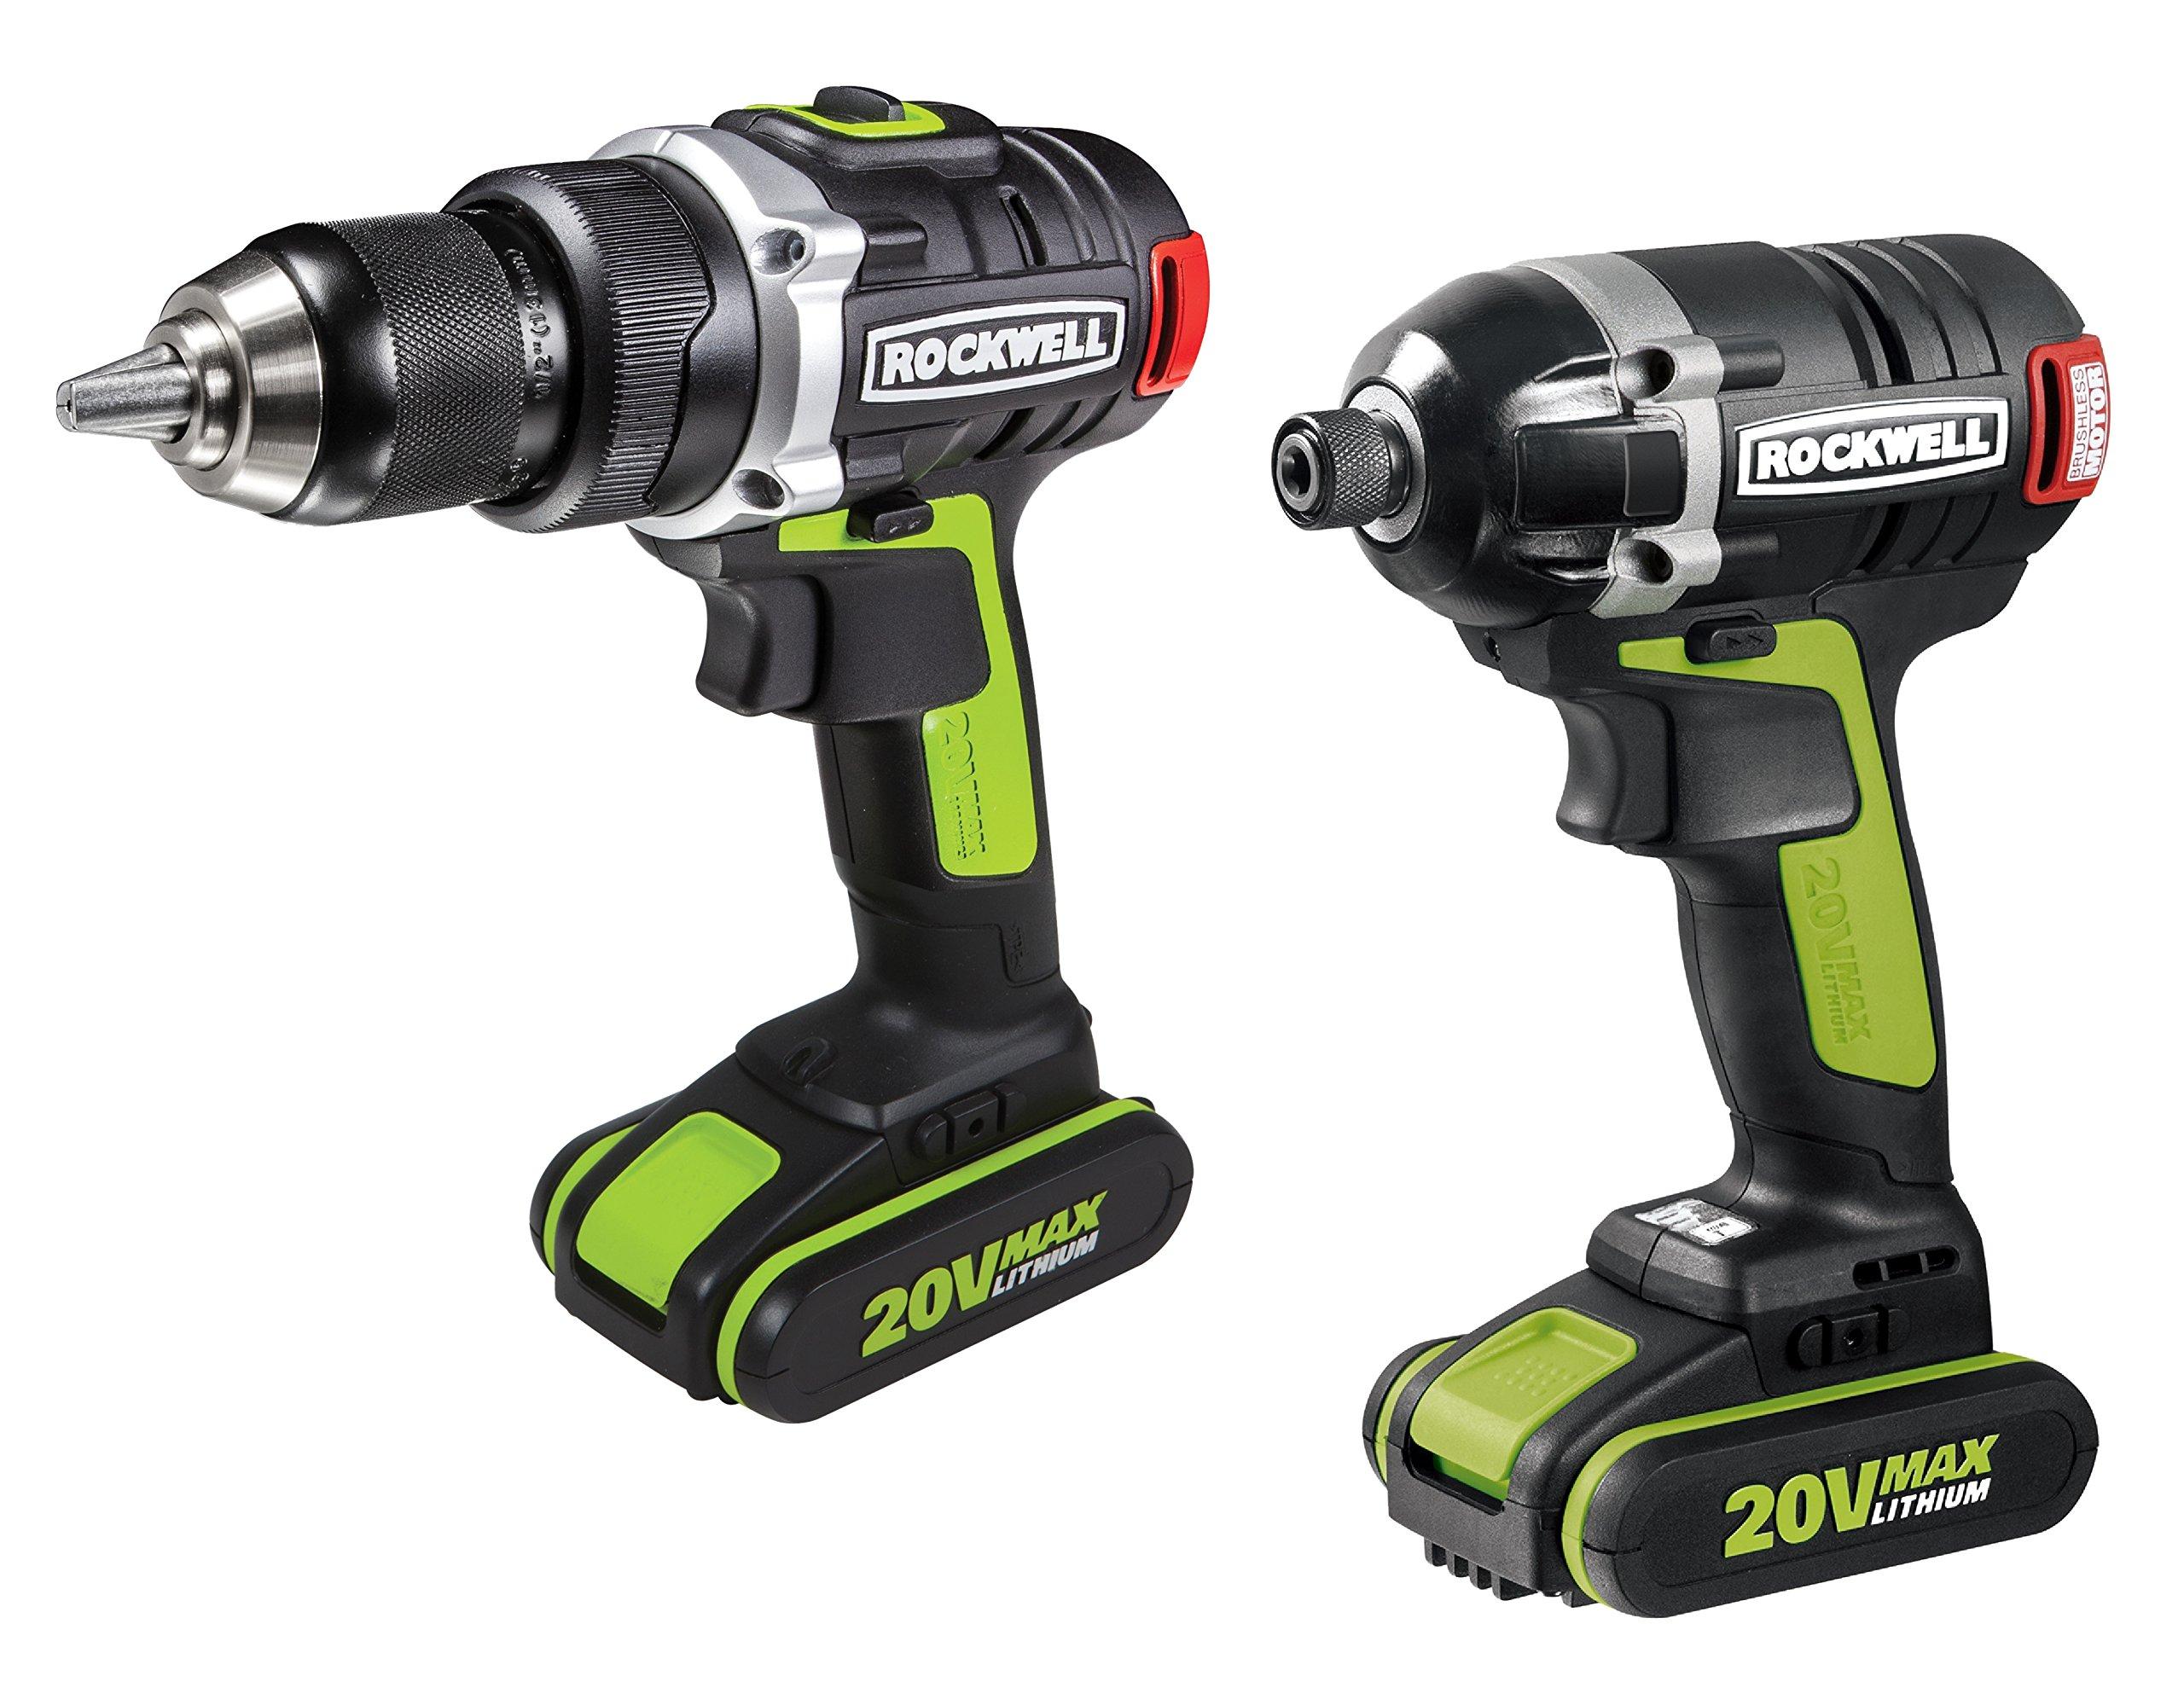 Rockwell RK1807K2 20V Brushless Drill/Impact Driver Combo Kit, 2-Piece